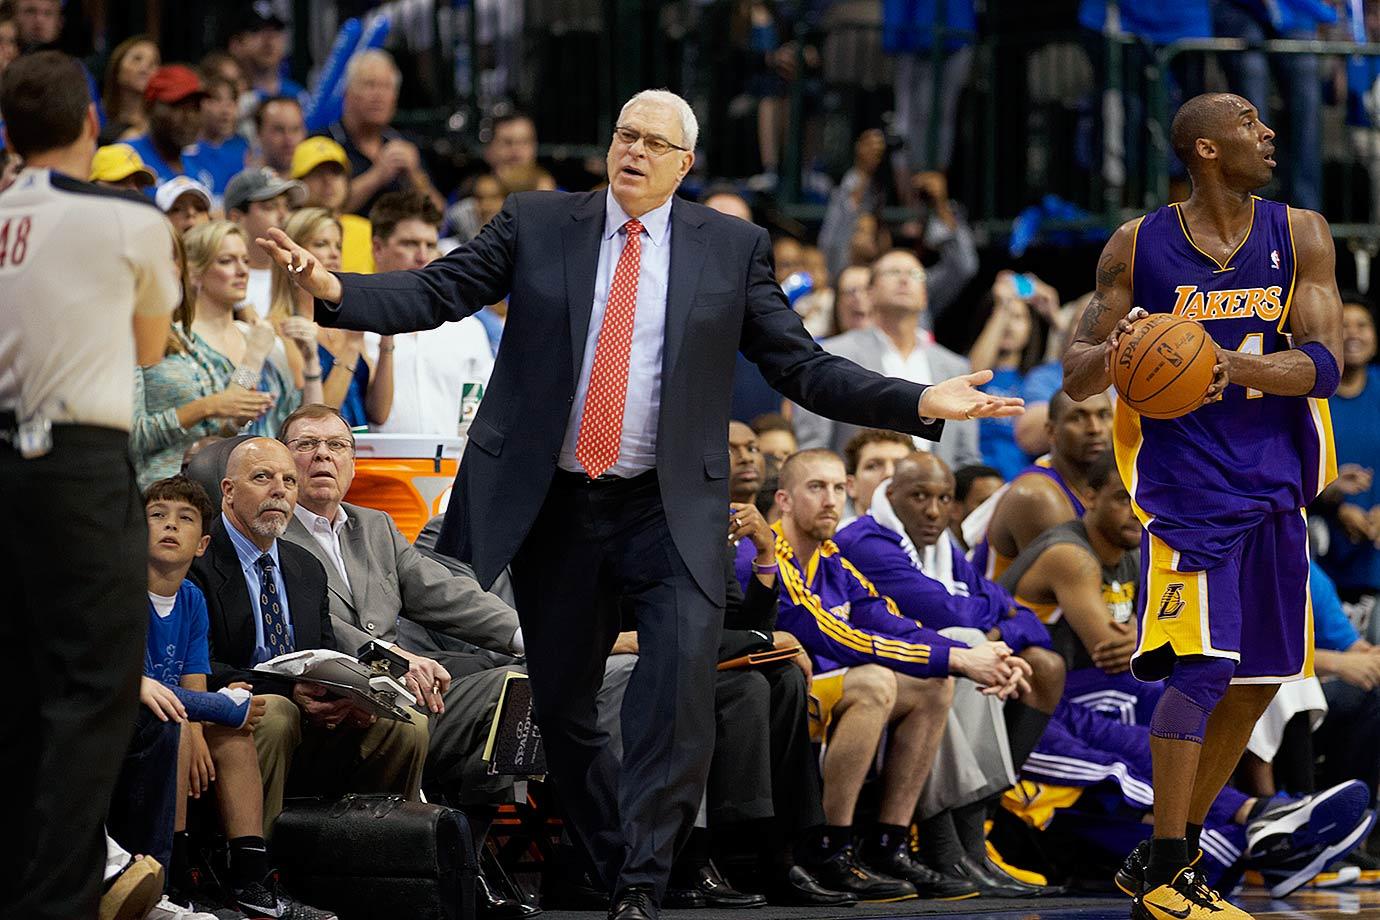 May 8, 2011 — NBA Western Conference Semifinals, Game 4